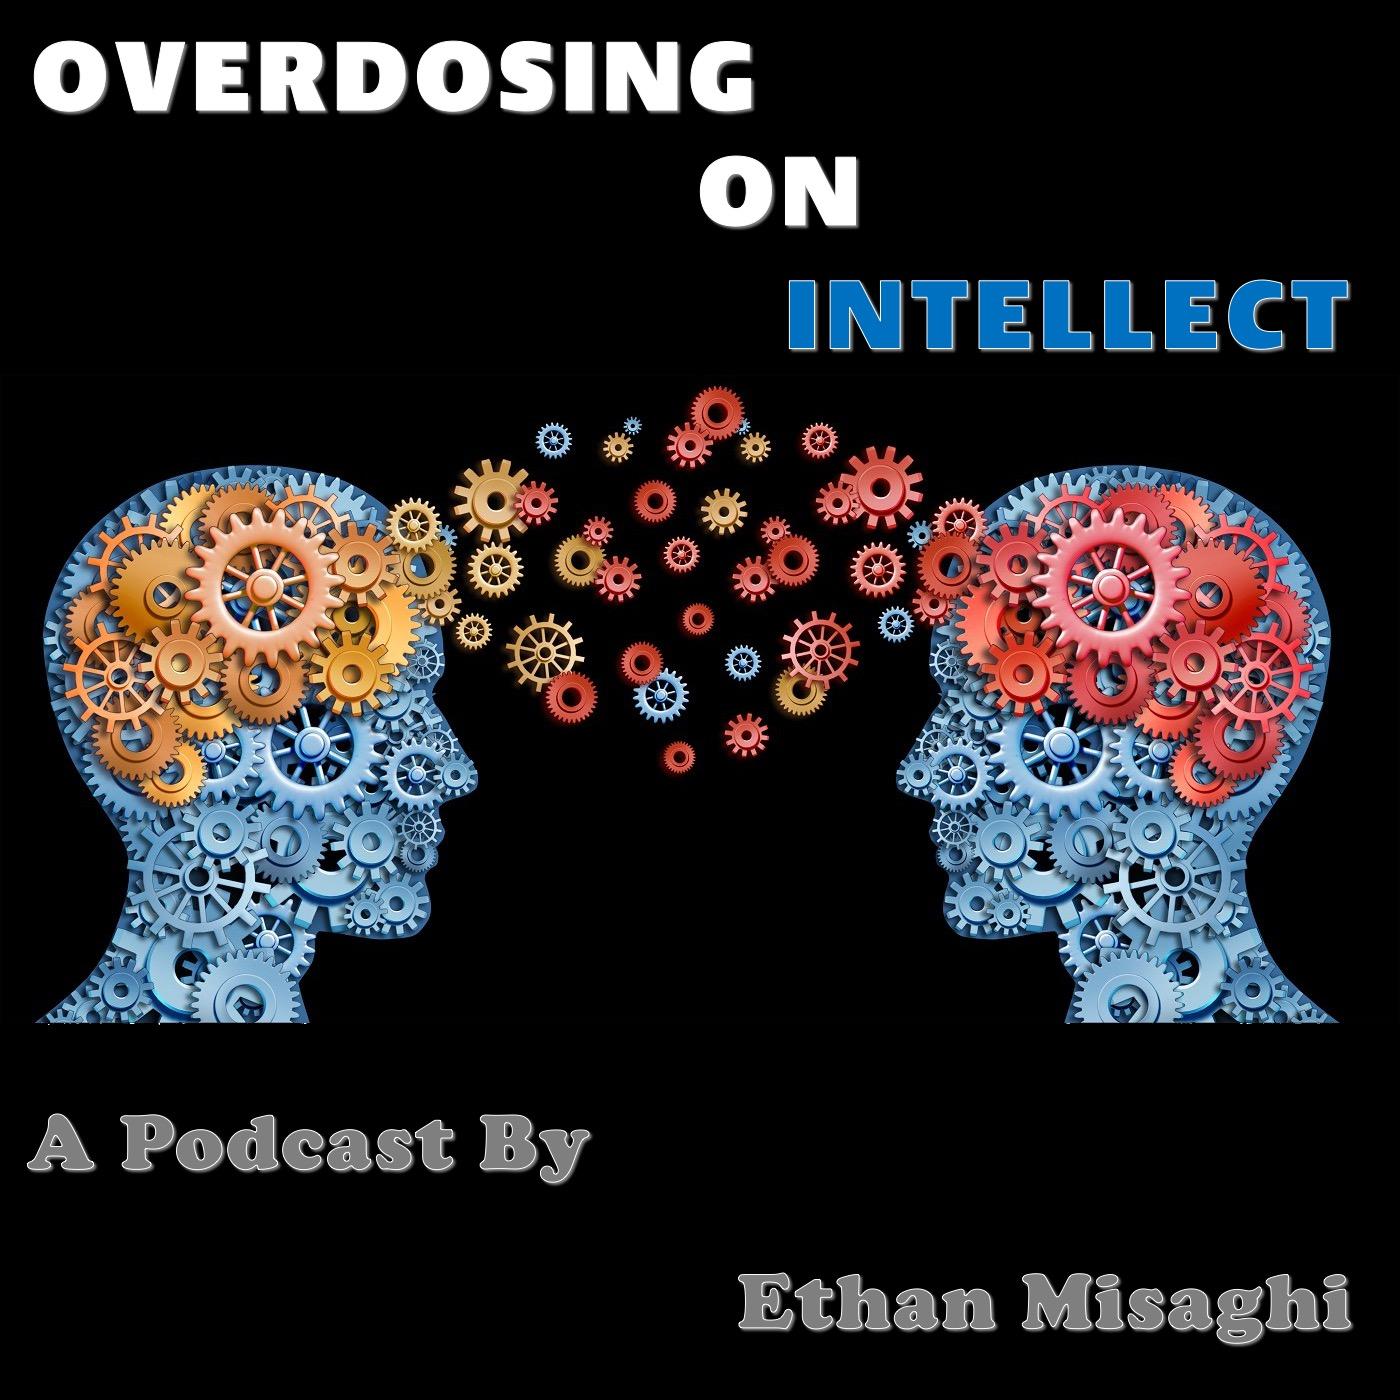 Overdosing on Intellect